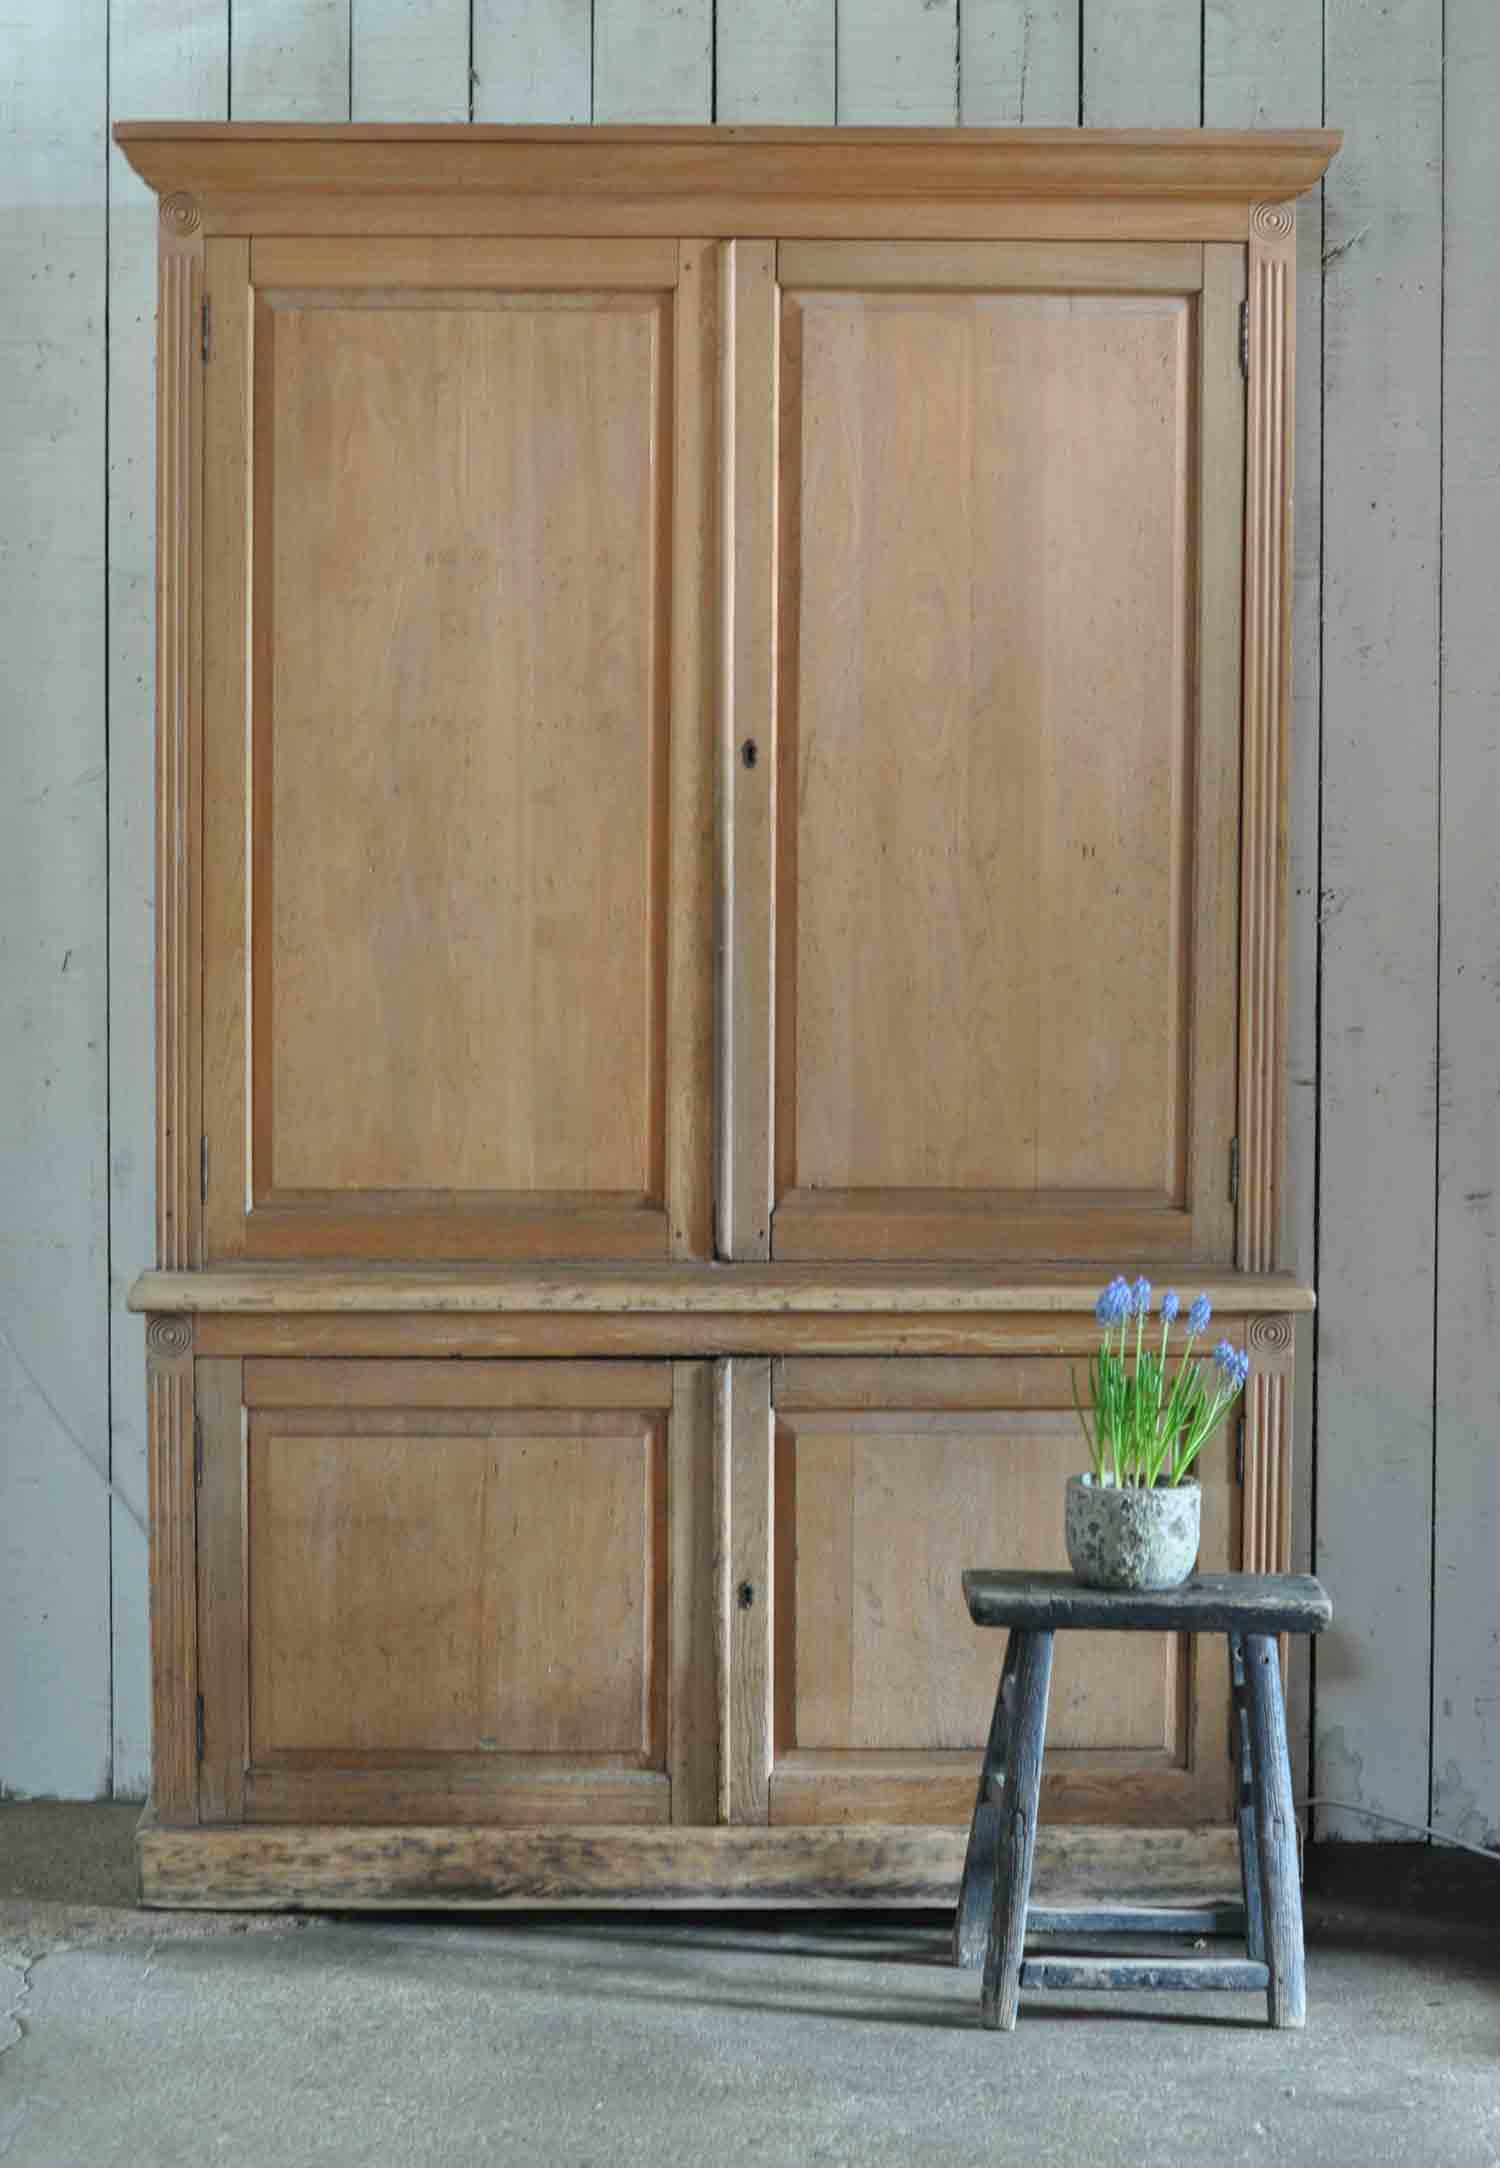 Antique Solid Oak Chiltern Valley School Cupboard Dresser